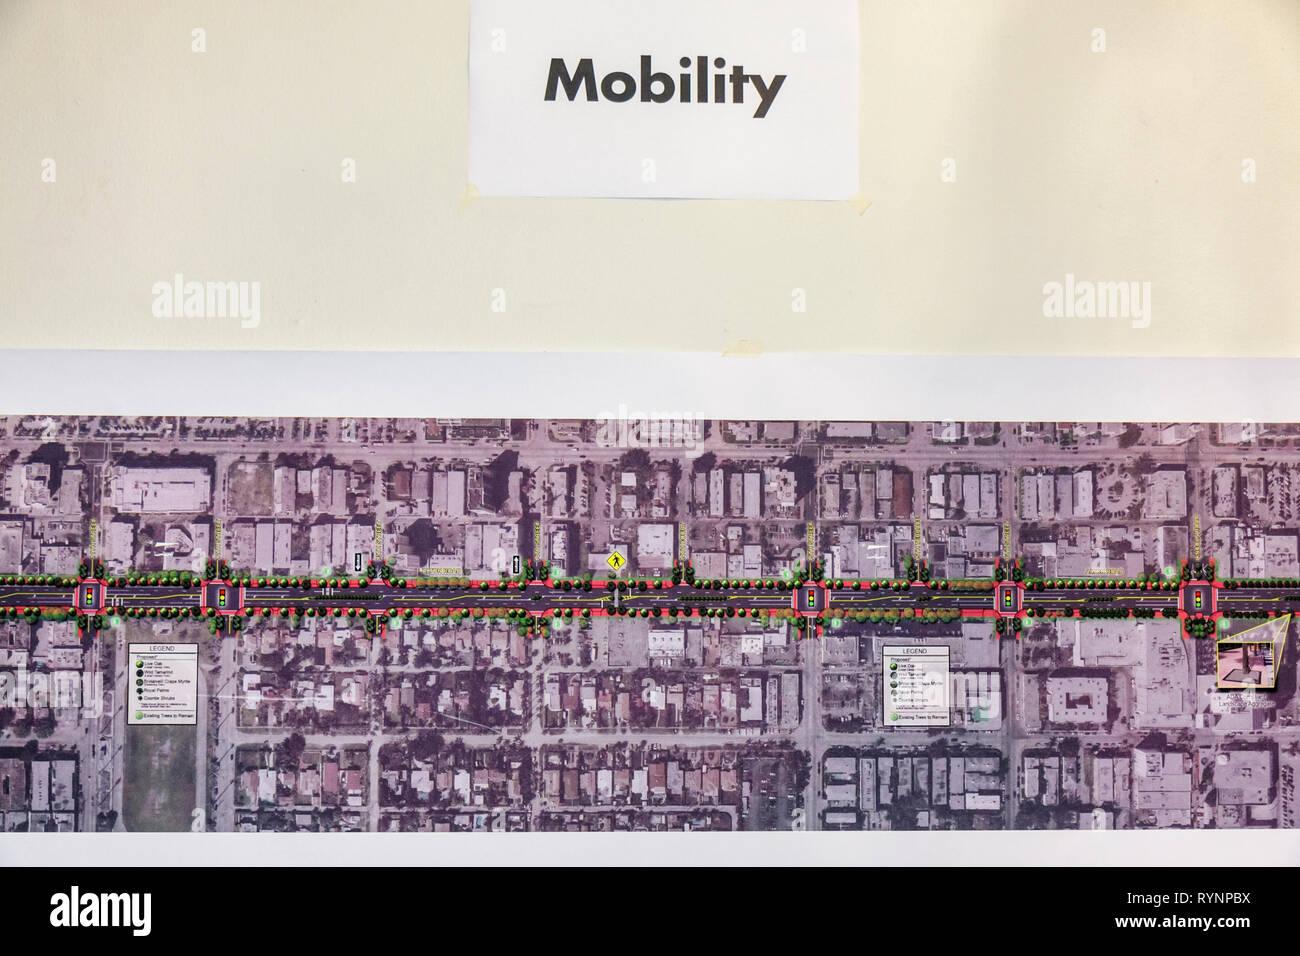 Miami Beach Florida Community Planning Workshop Alton Road Korridor zukünftige City Board Karte Poster Präsentation Informationen mobili Stockbild